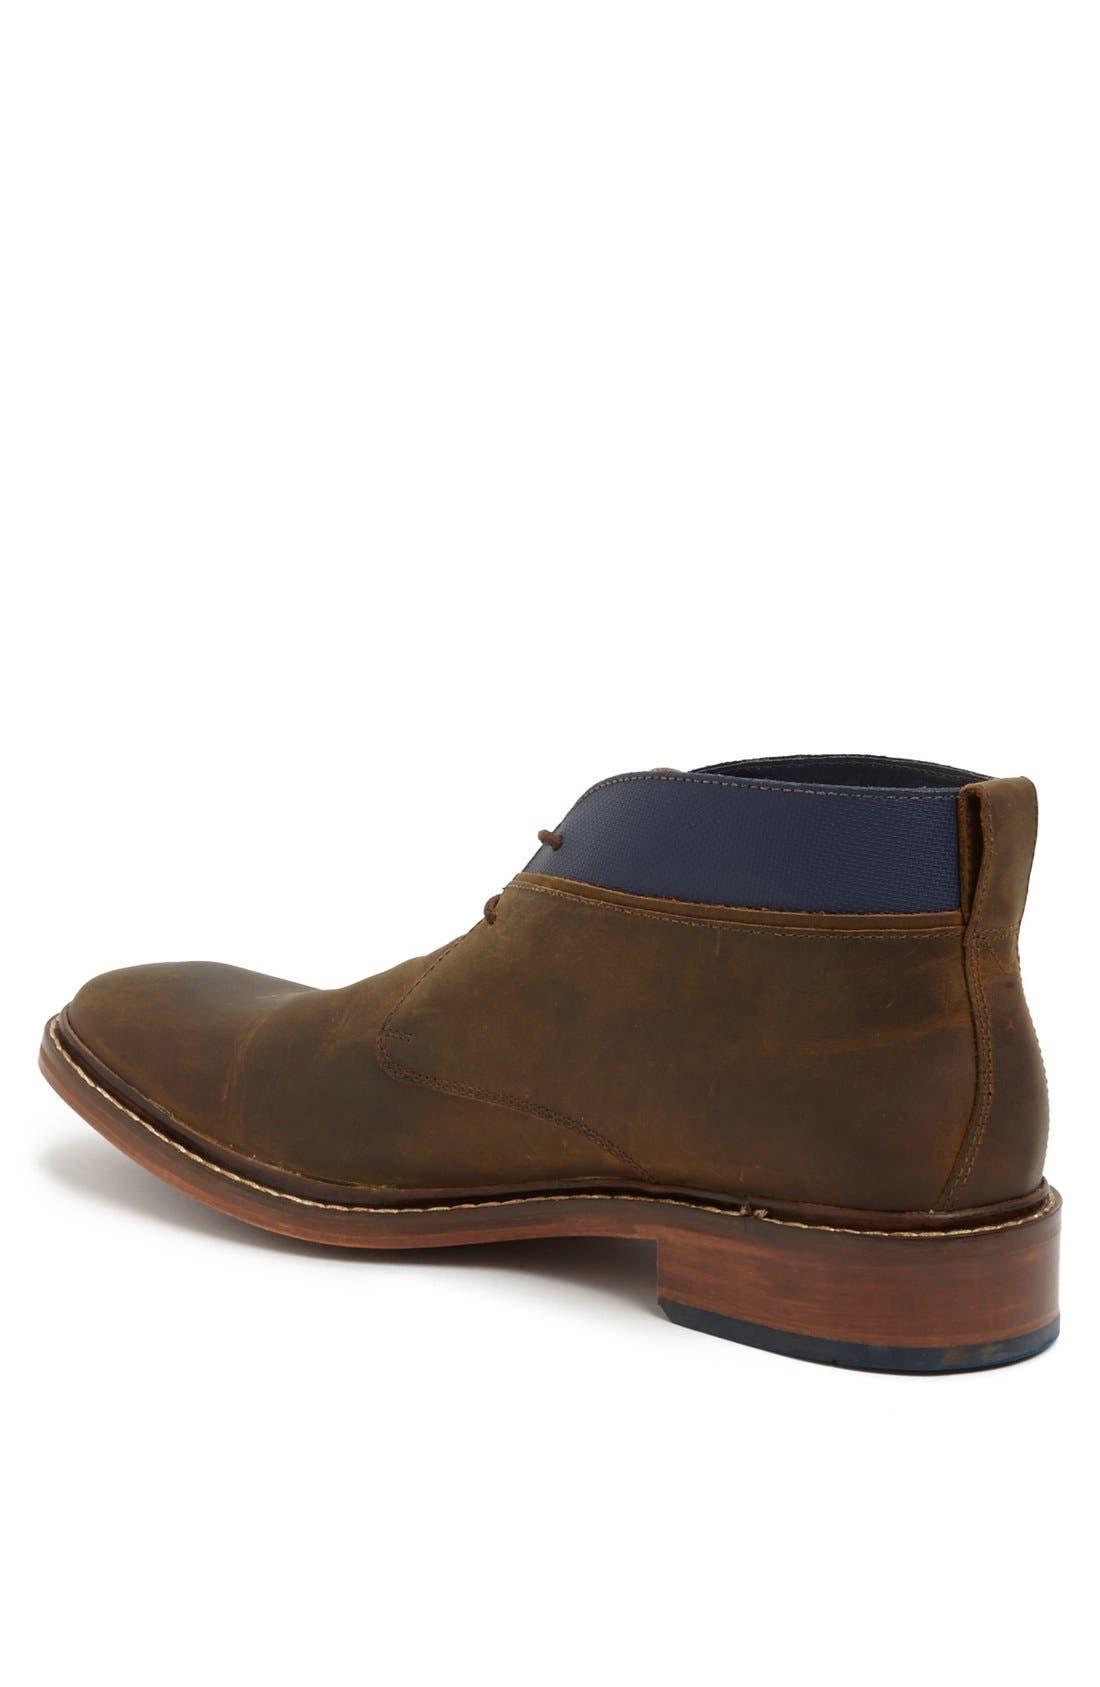 'Colton' Chukka Boot,                             Alternate thumbnail 3, color,                             Copper/ Peacoat Leather